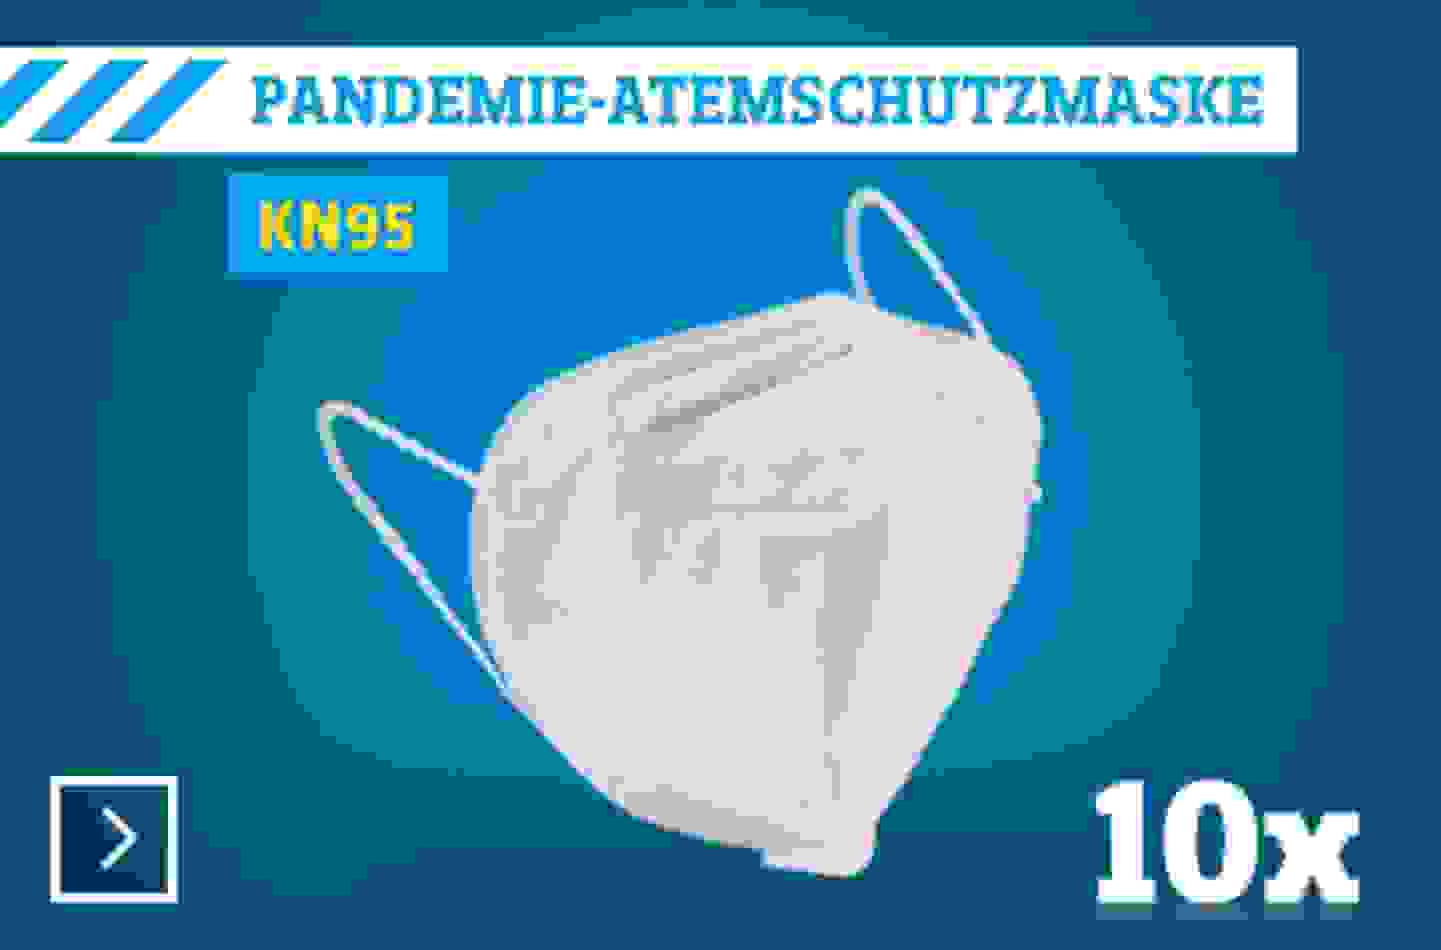 KN 95 Pandemie Atemschutzmaske